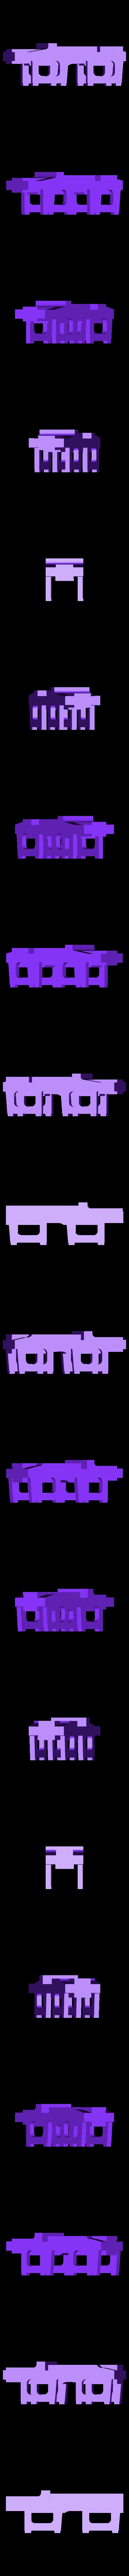 Front_Engine_-_Part_6.STL Download free STL file 4-8-8-4 Big Boy Locomotive • 3D printer object, RaymondDeLuca